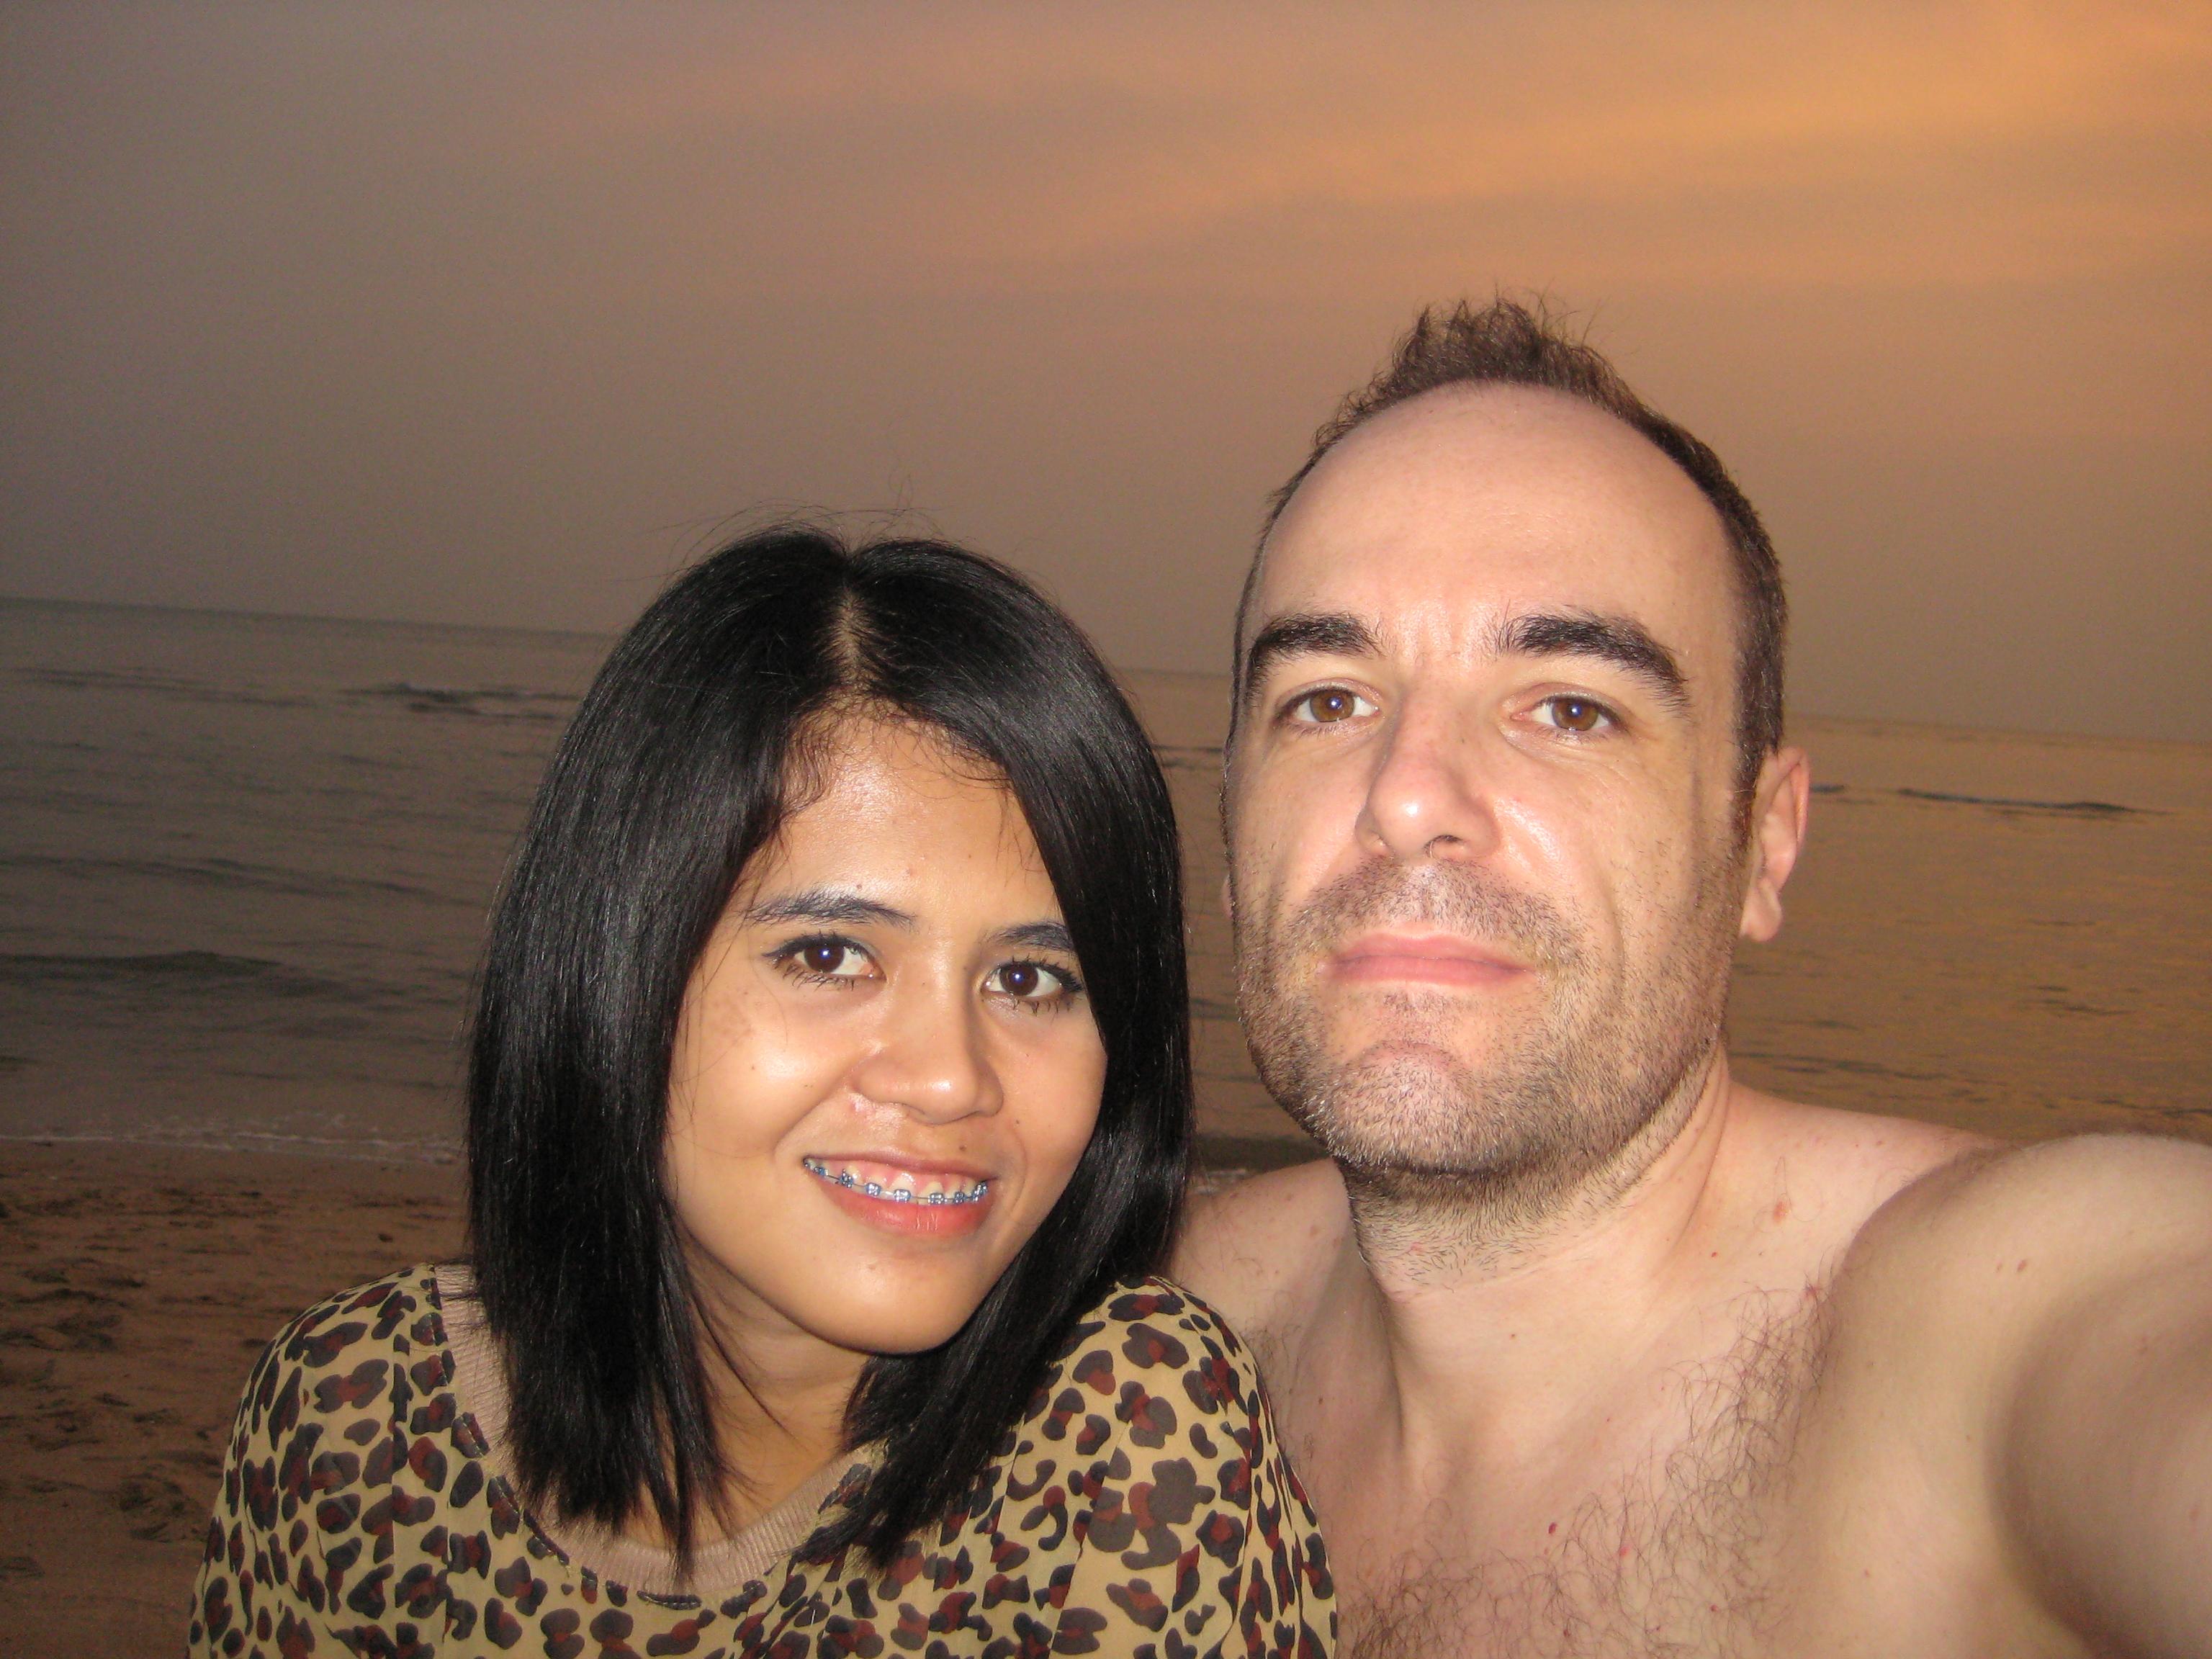 thai massage guide internet dating